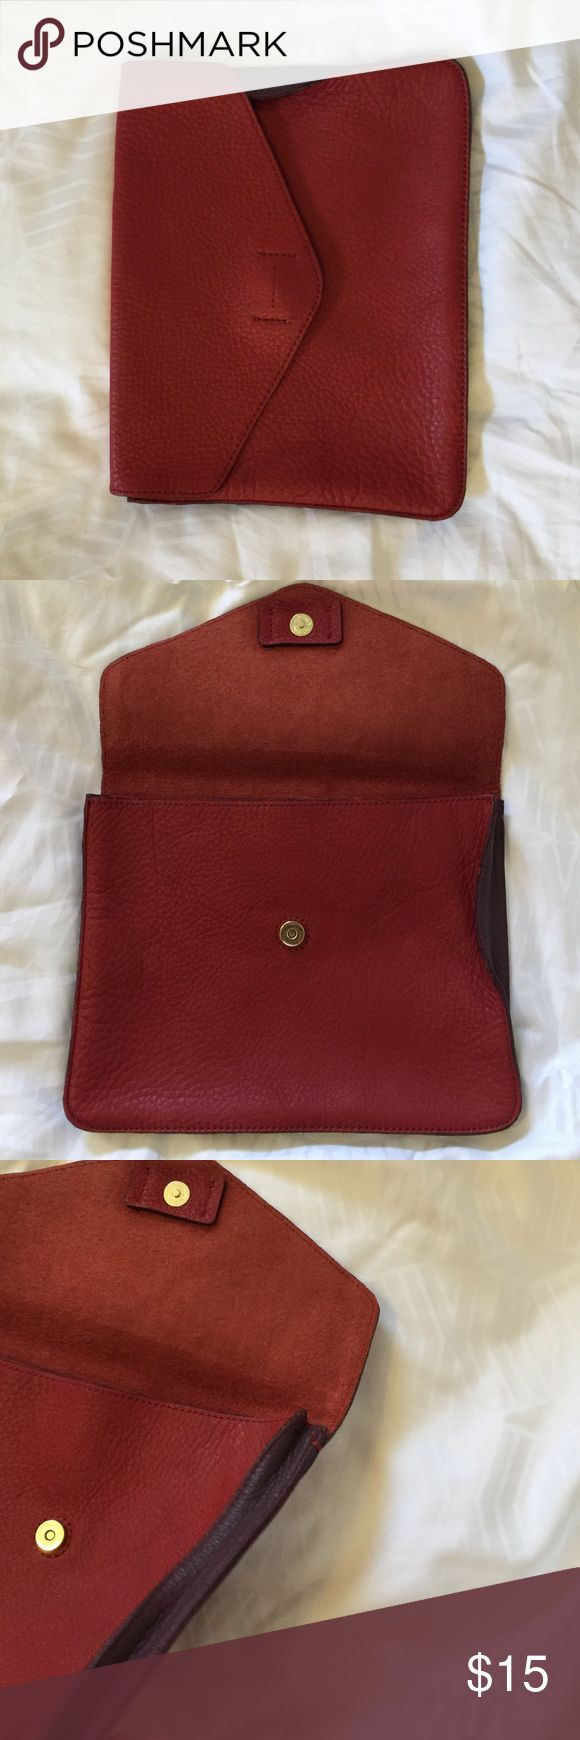 Leather Gap bag Makeup or small bag GAP Bags Cosmetic Bags & Cases